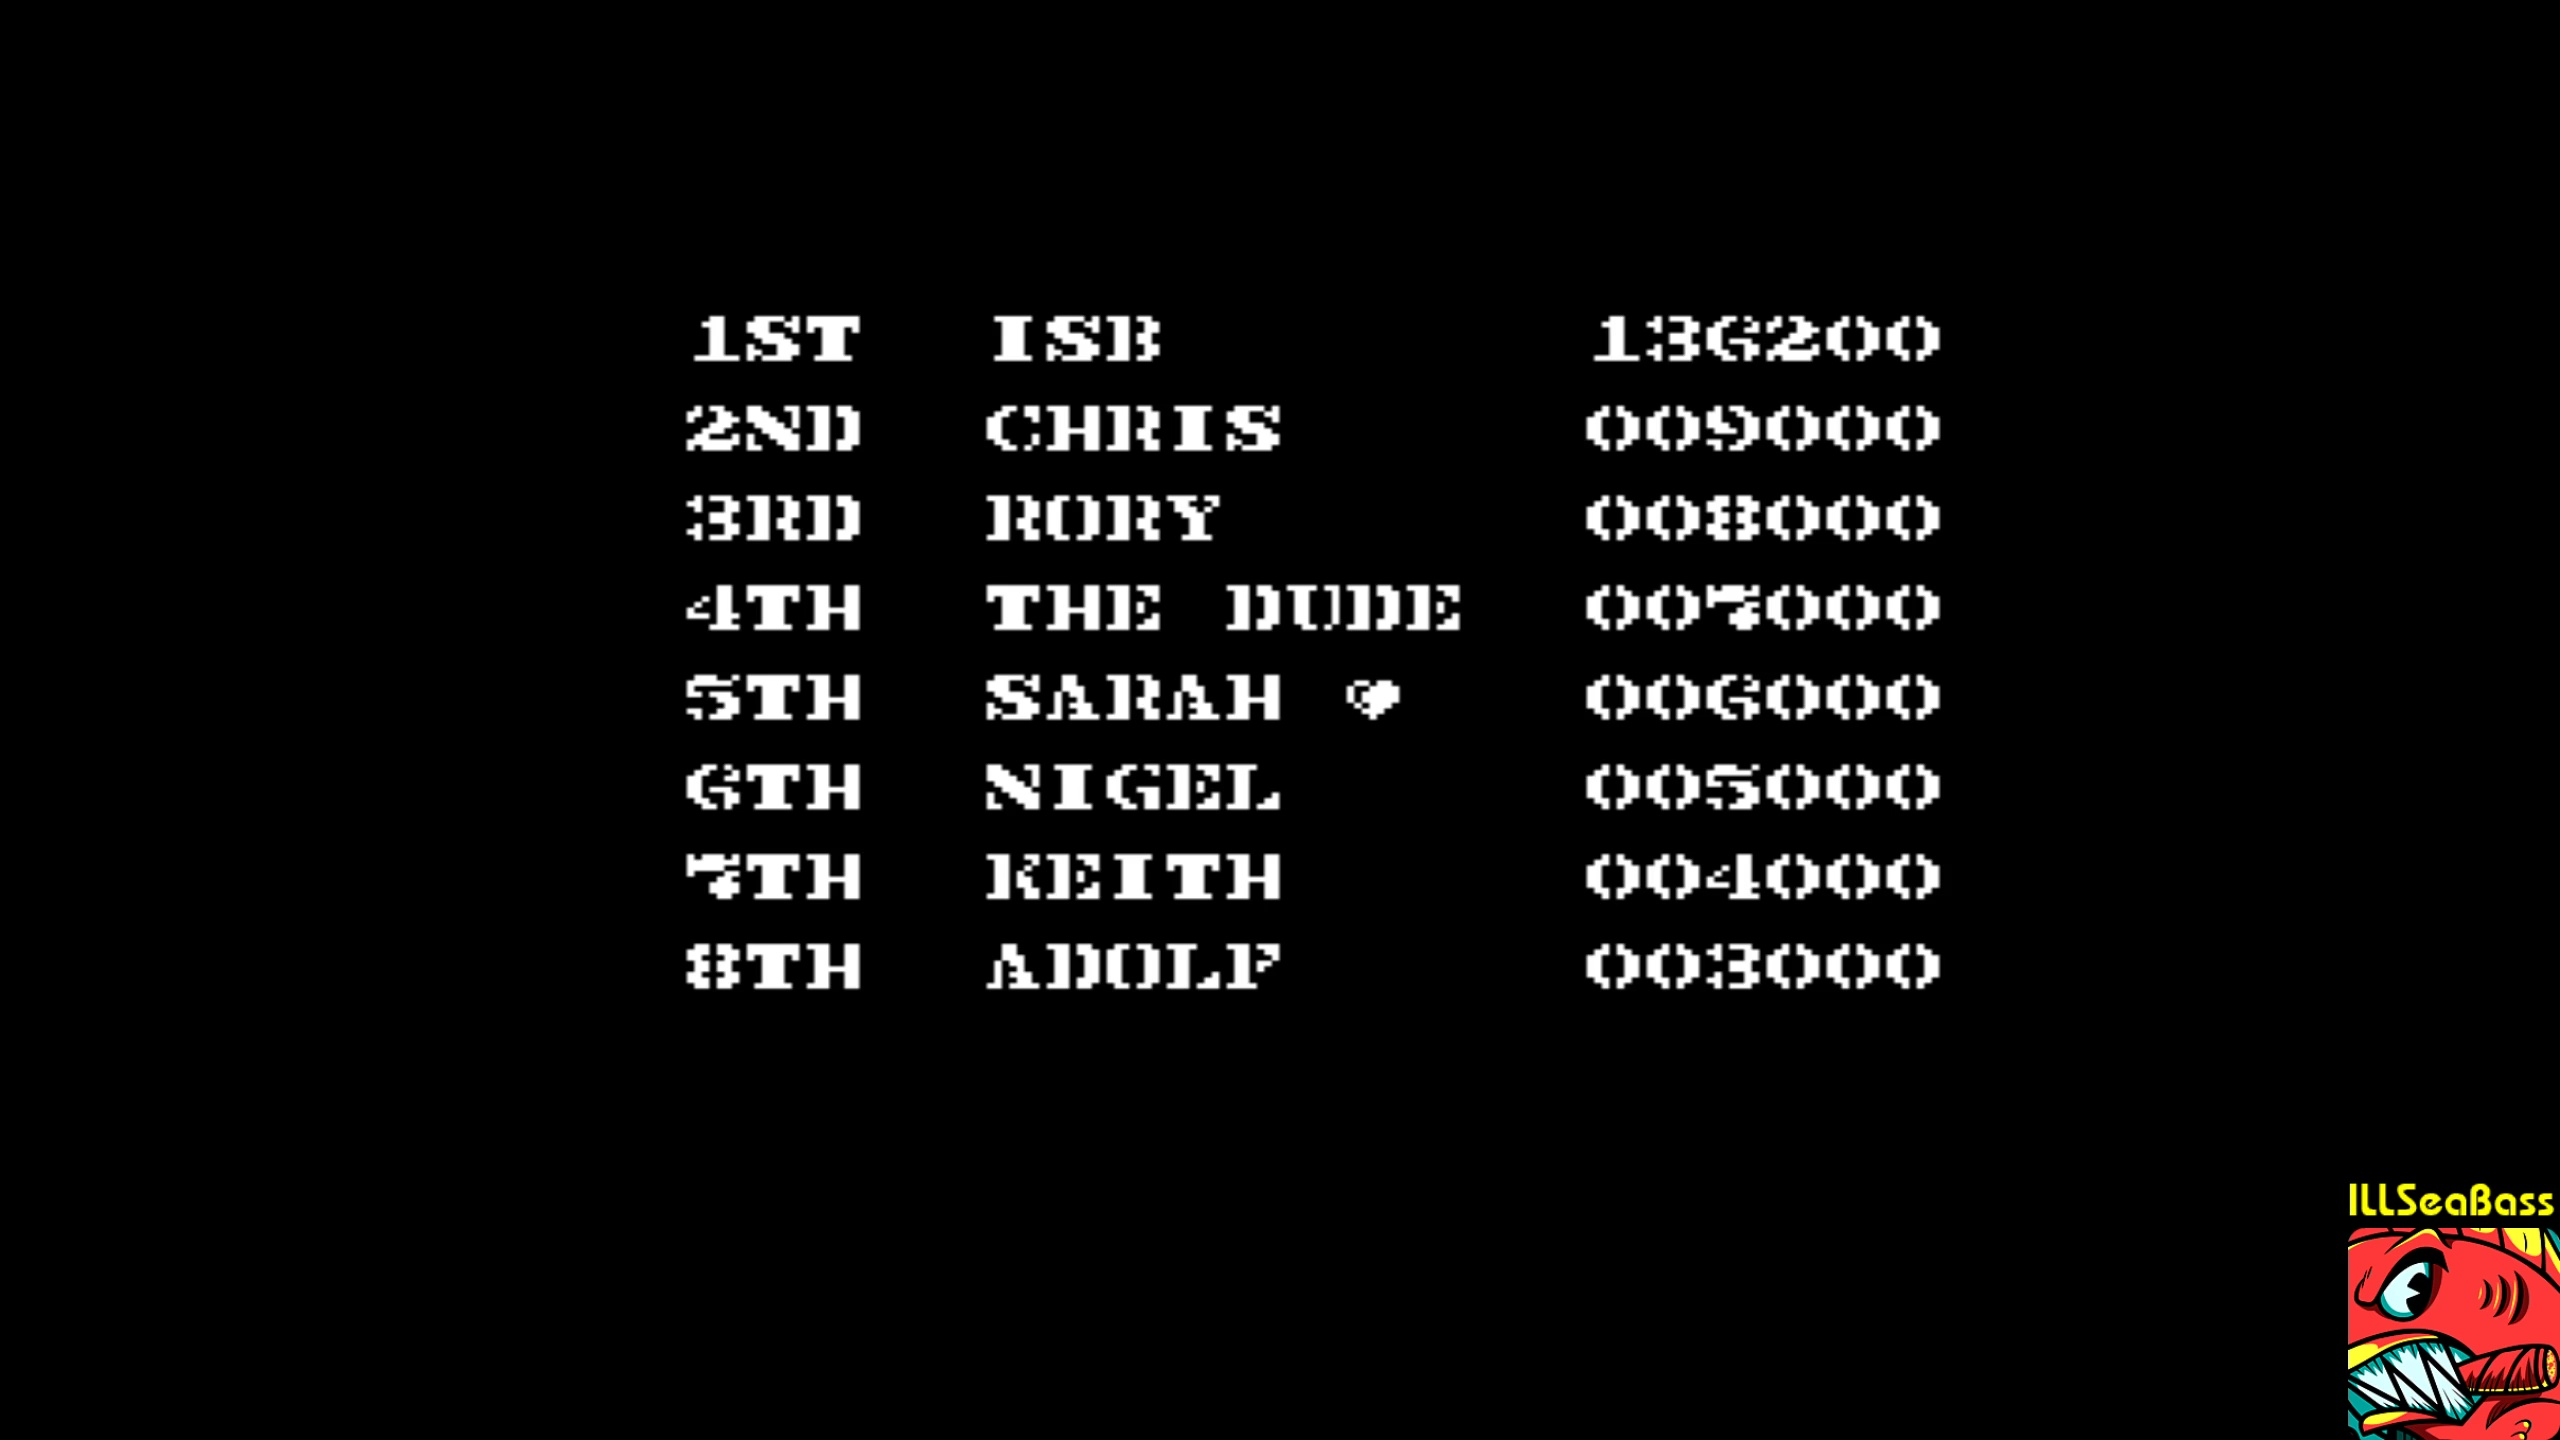 ILLSeaBass: Commando (Commodore 64 Emulated) 136,200 points on 2018-02-10 10:57:20